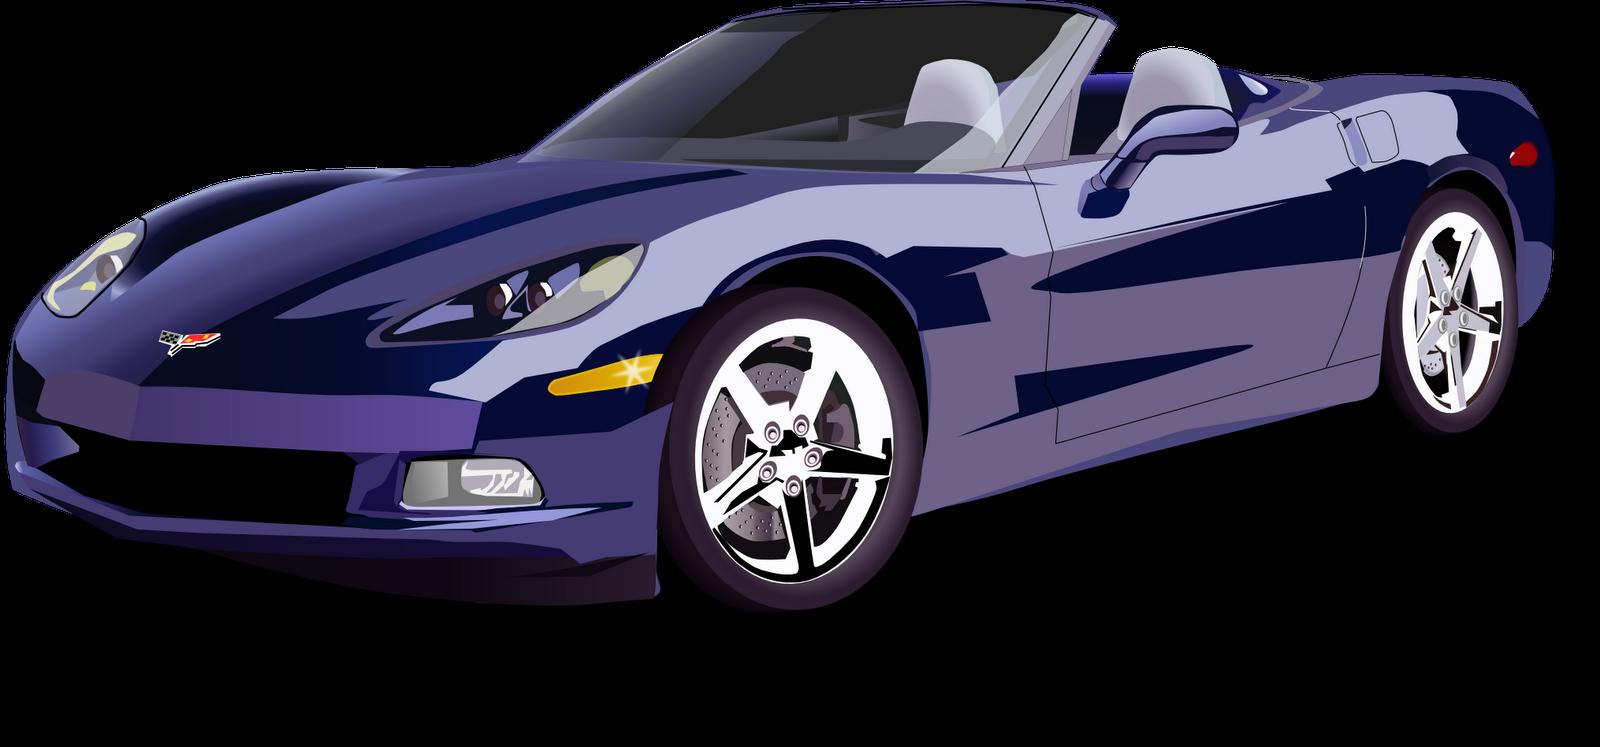 Race Car Png Hd: Design New Ferrari Cars, Accessories And Interiors: New